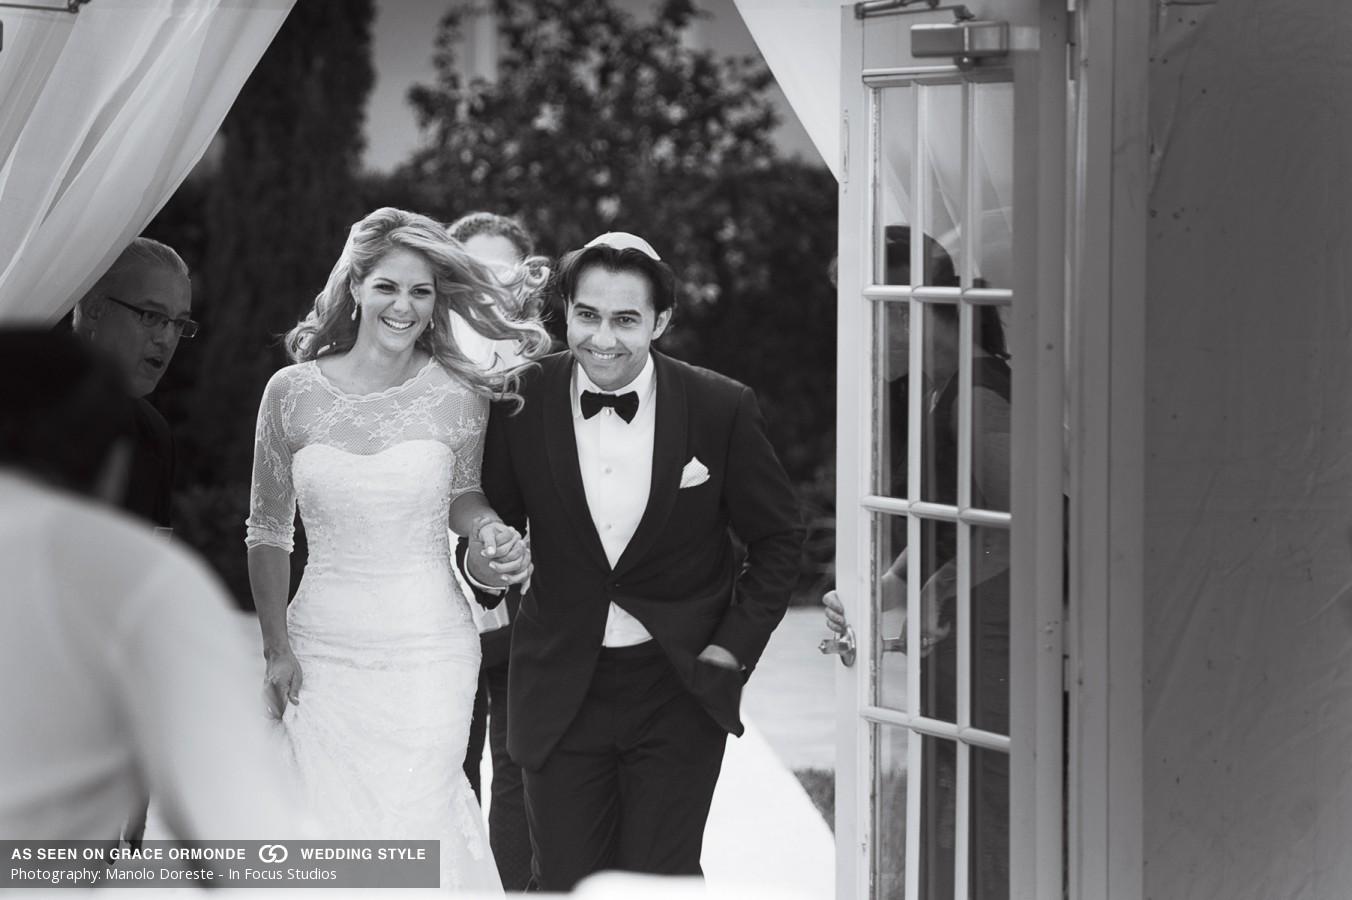 manolo-doreste-wedding-ss14-002.jpg